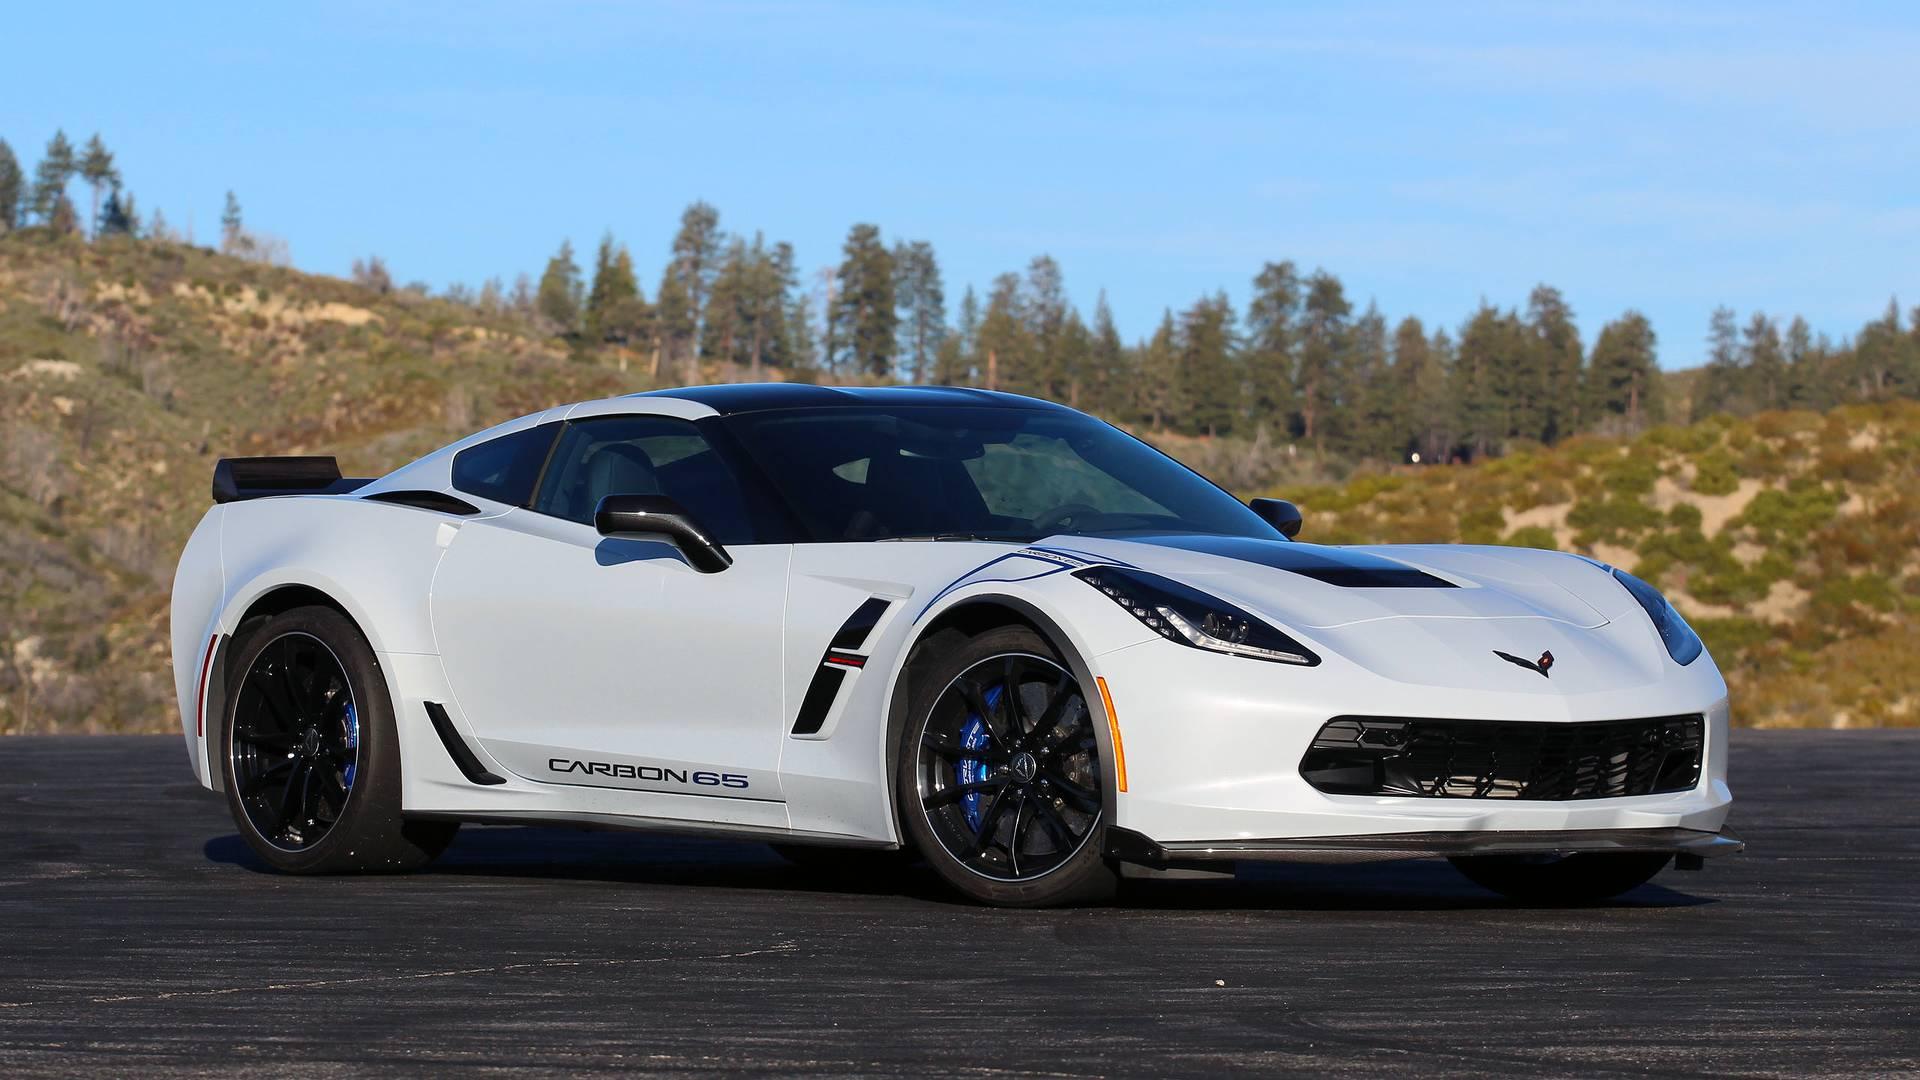 2018 Chevy Corvette Grand Sport Review Already Special No Stickers